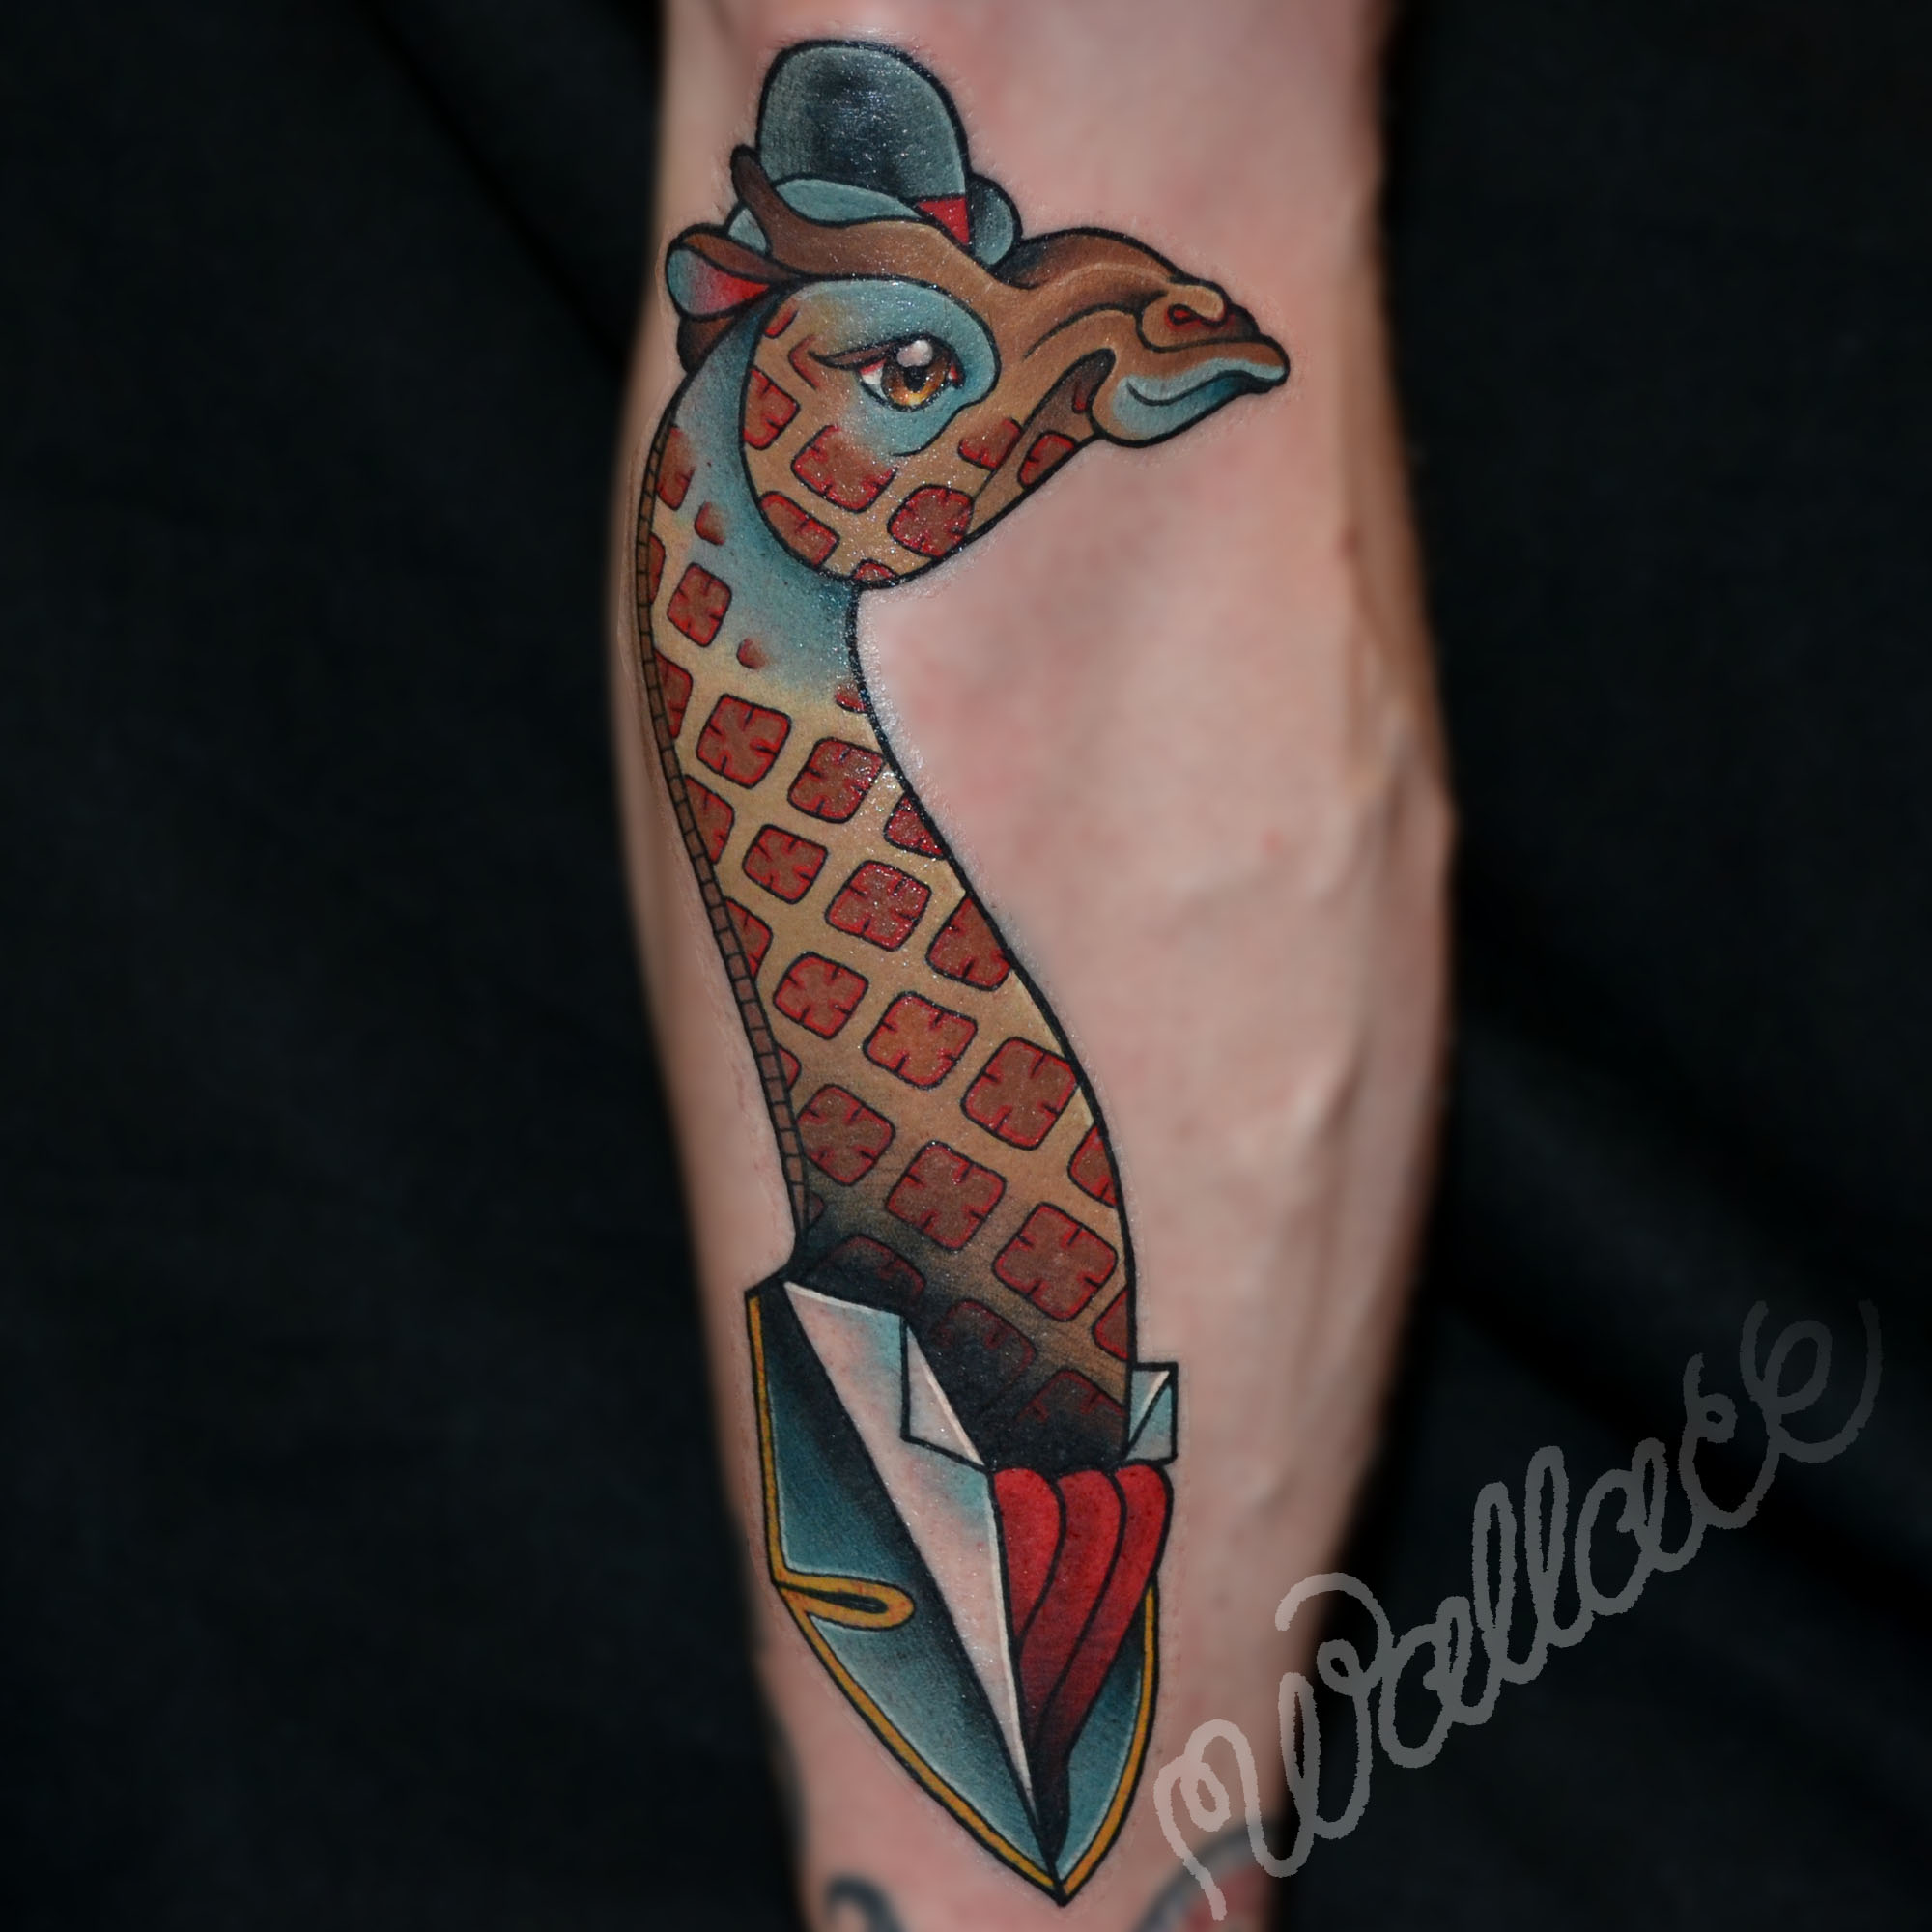 Giraffe Tattoo RAYMOND WALLACE TATTOOING